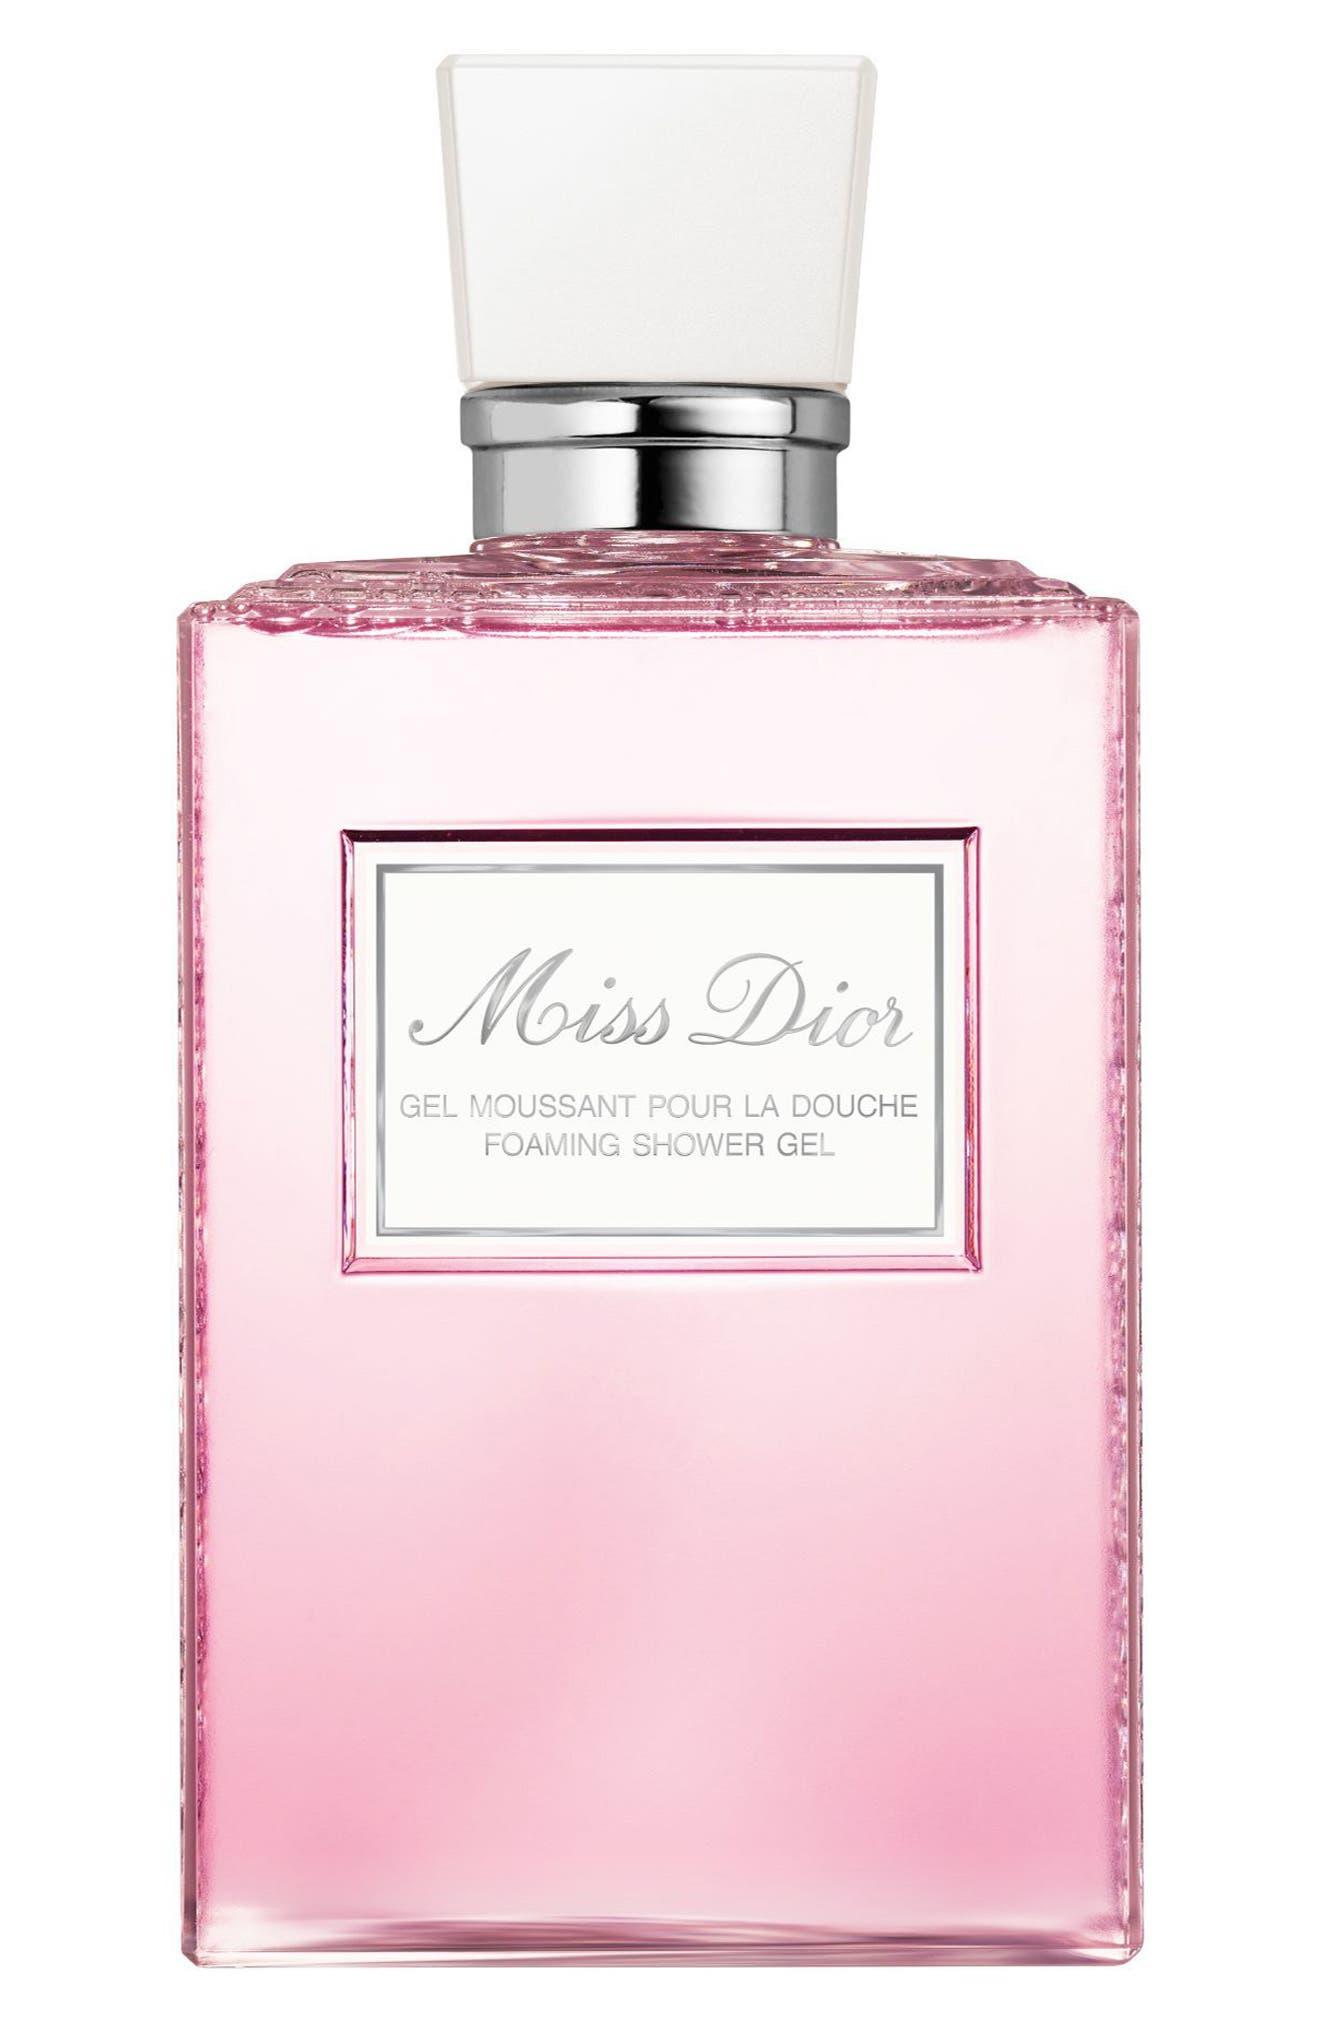 Miss Dior Foaming Shower Gel,                             Main thumbnail 1, color,                             NO COLOR